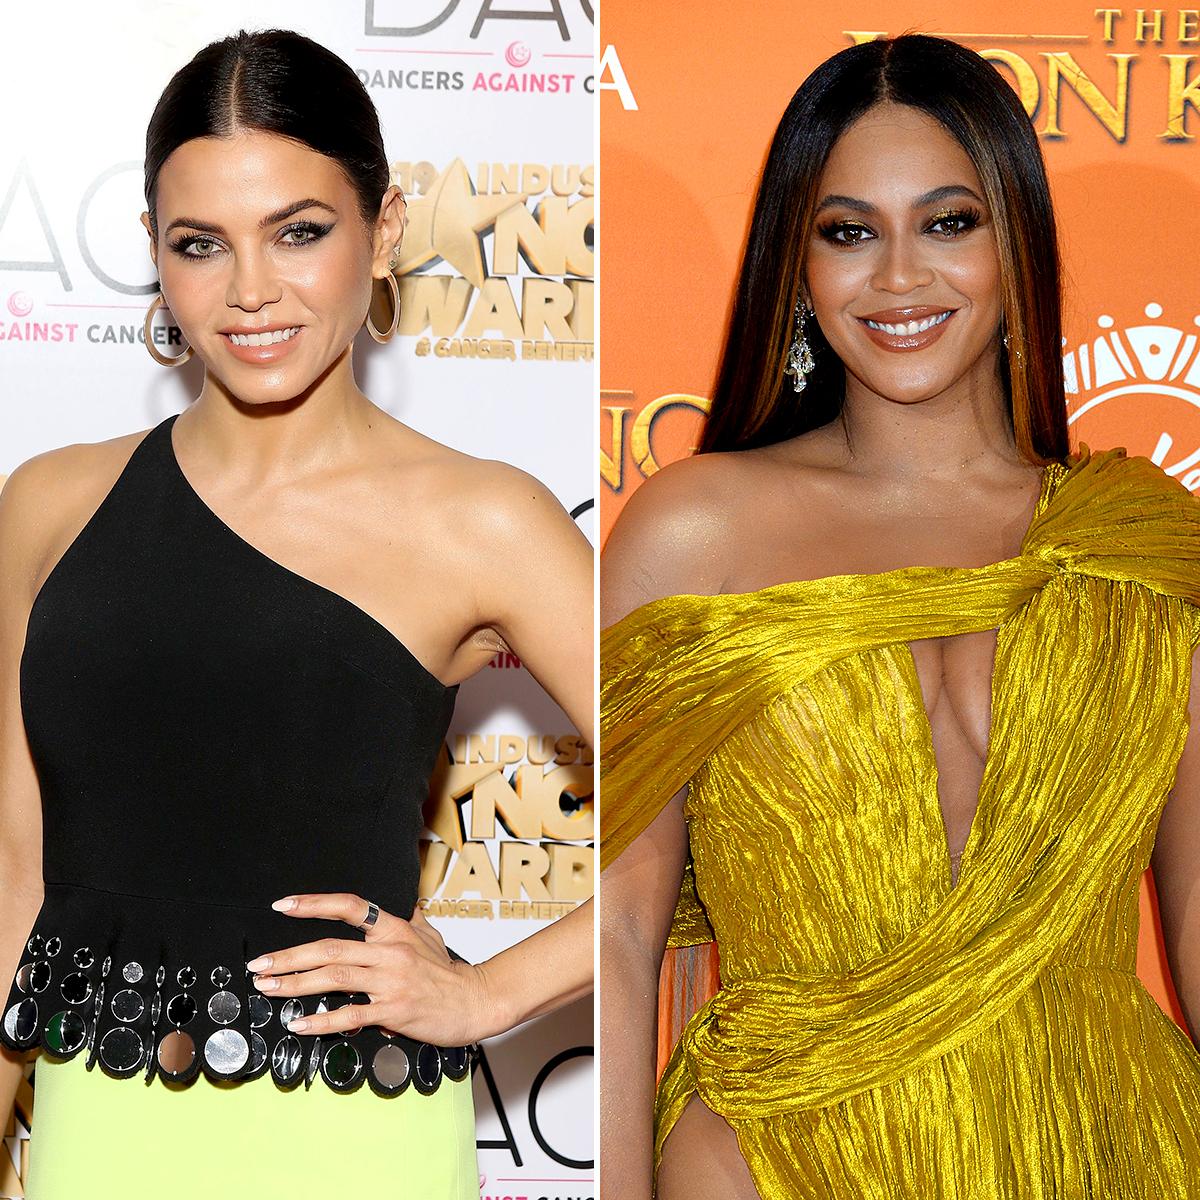 Watch Jenna Dewan Imitate and Critique Beyonce's Original Walk